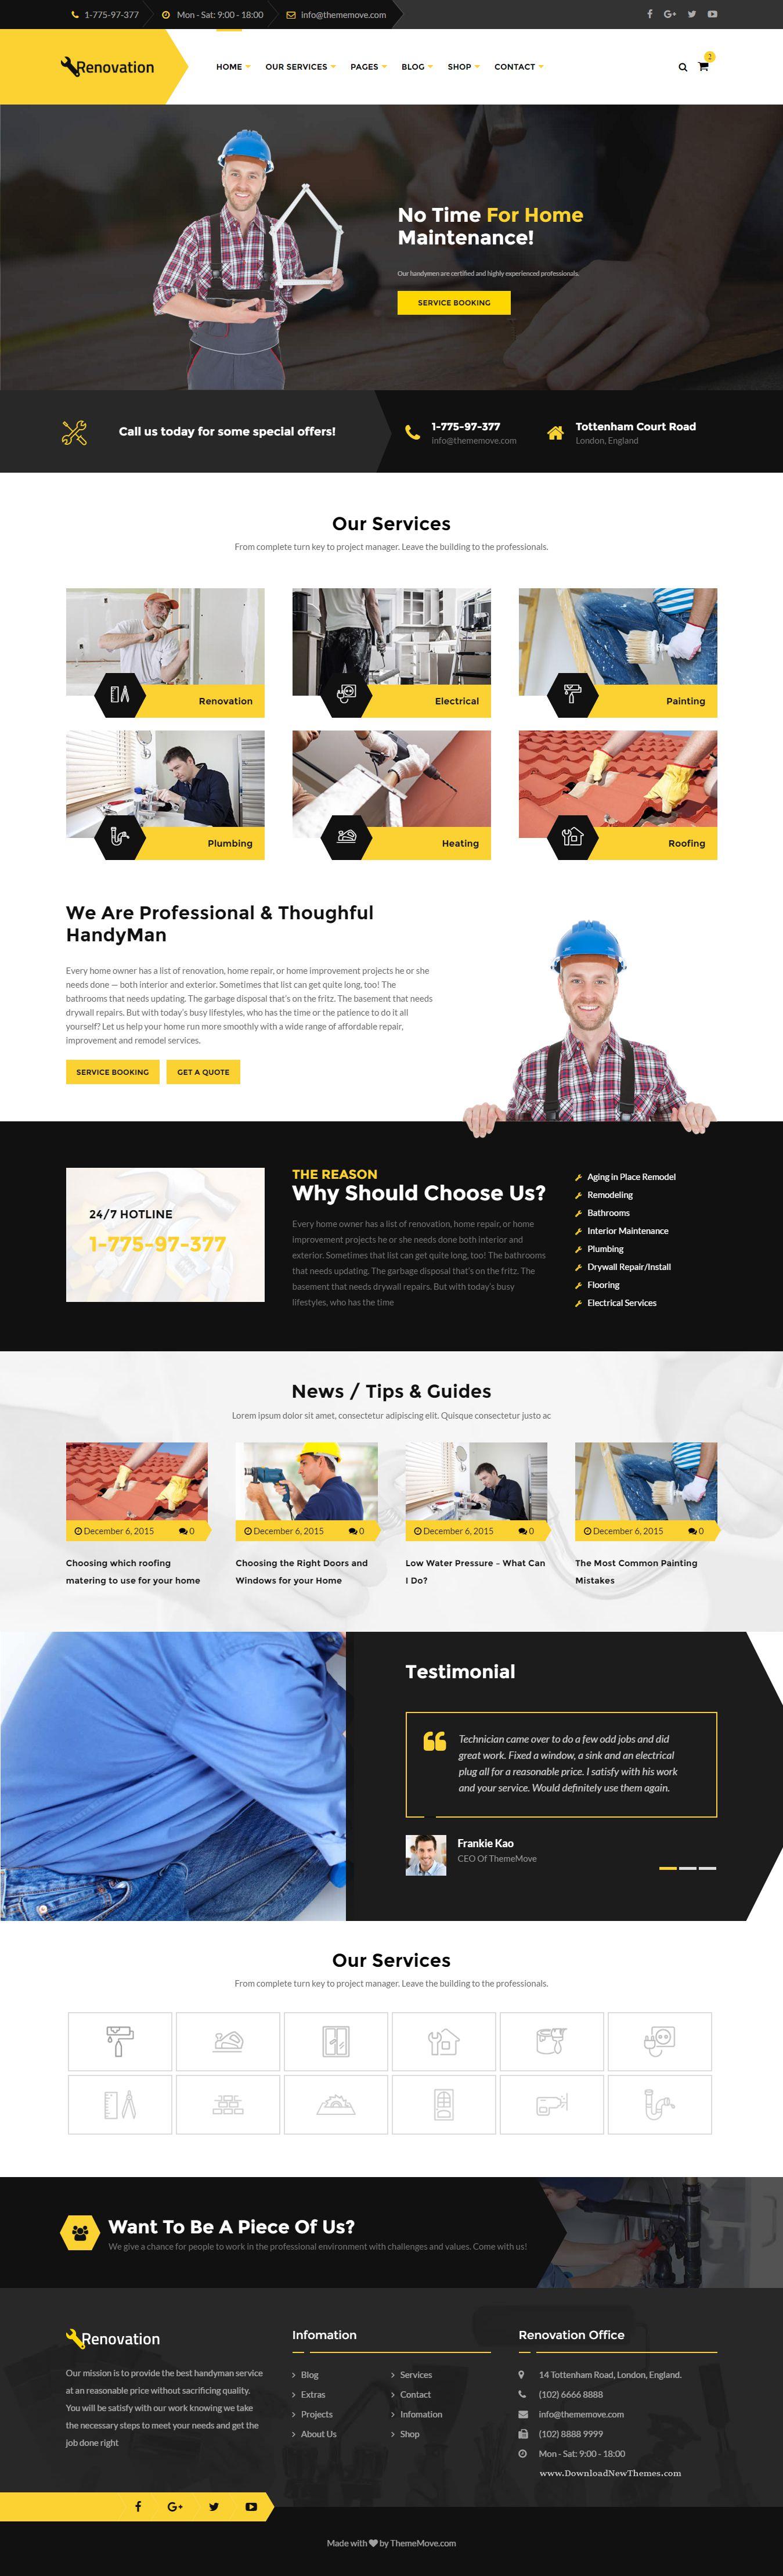 renovation wonderful home maintenance repair service html template